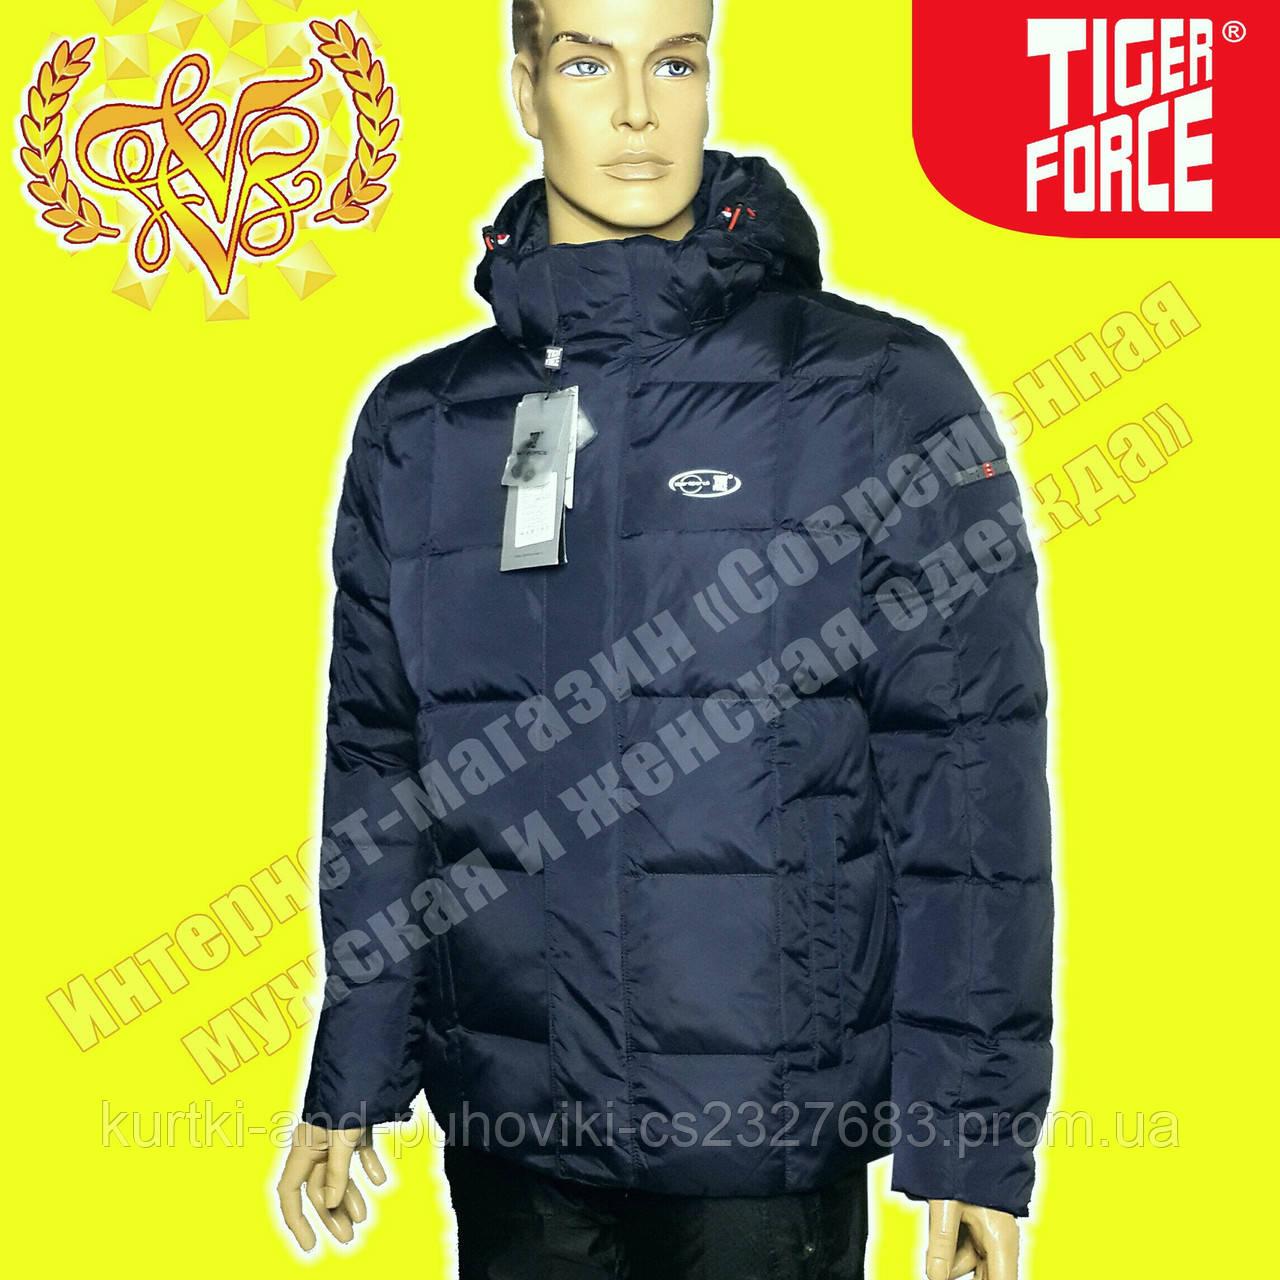 84b751b7b96d Мужские пуховики Tiger Force Sports - Интернет-магазин «Современная мужская  и женская одежда»